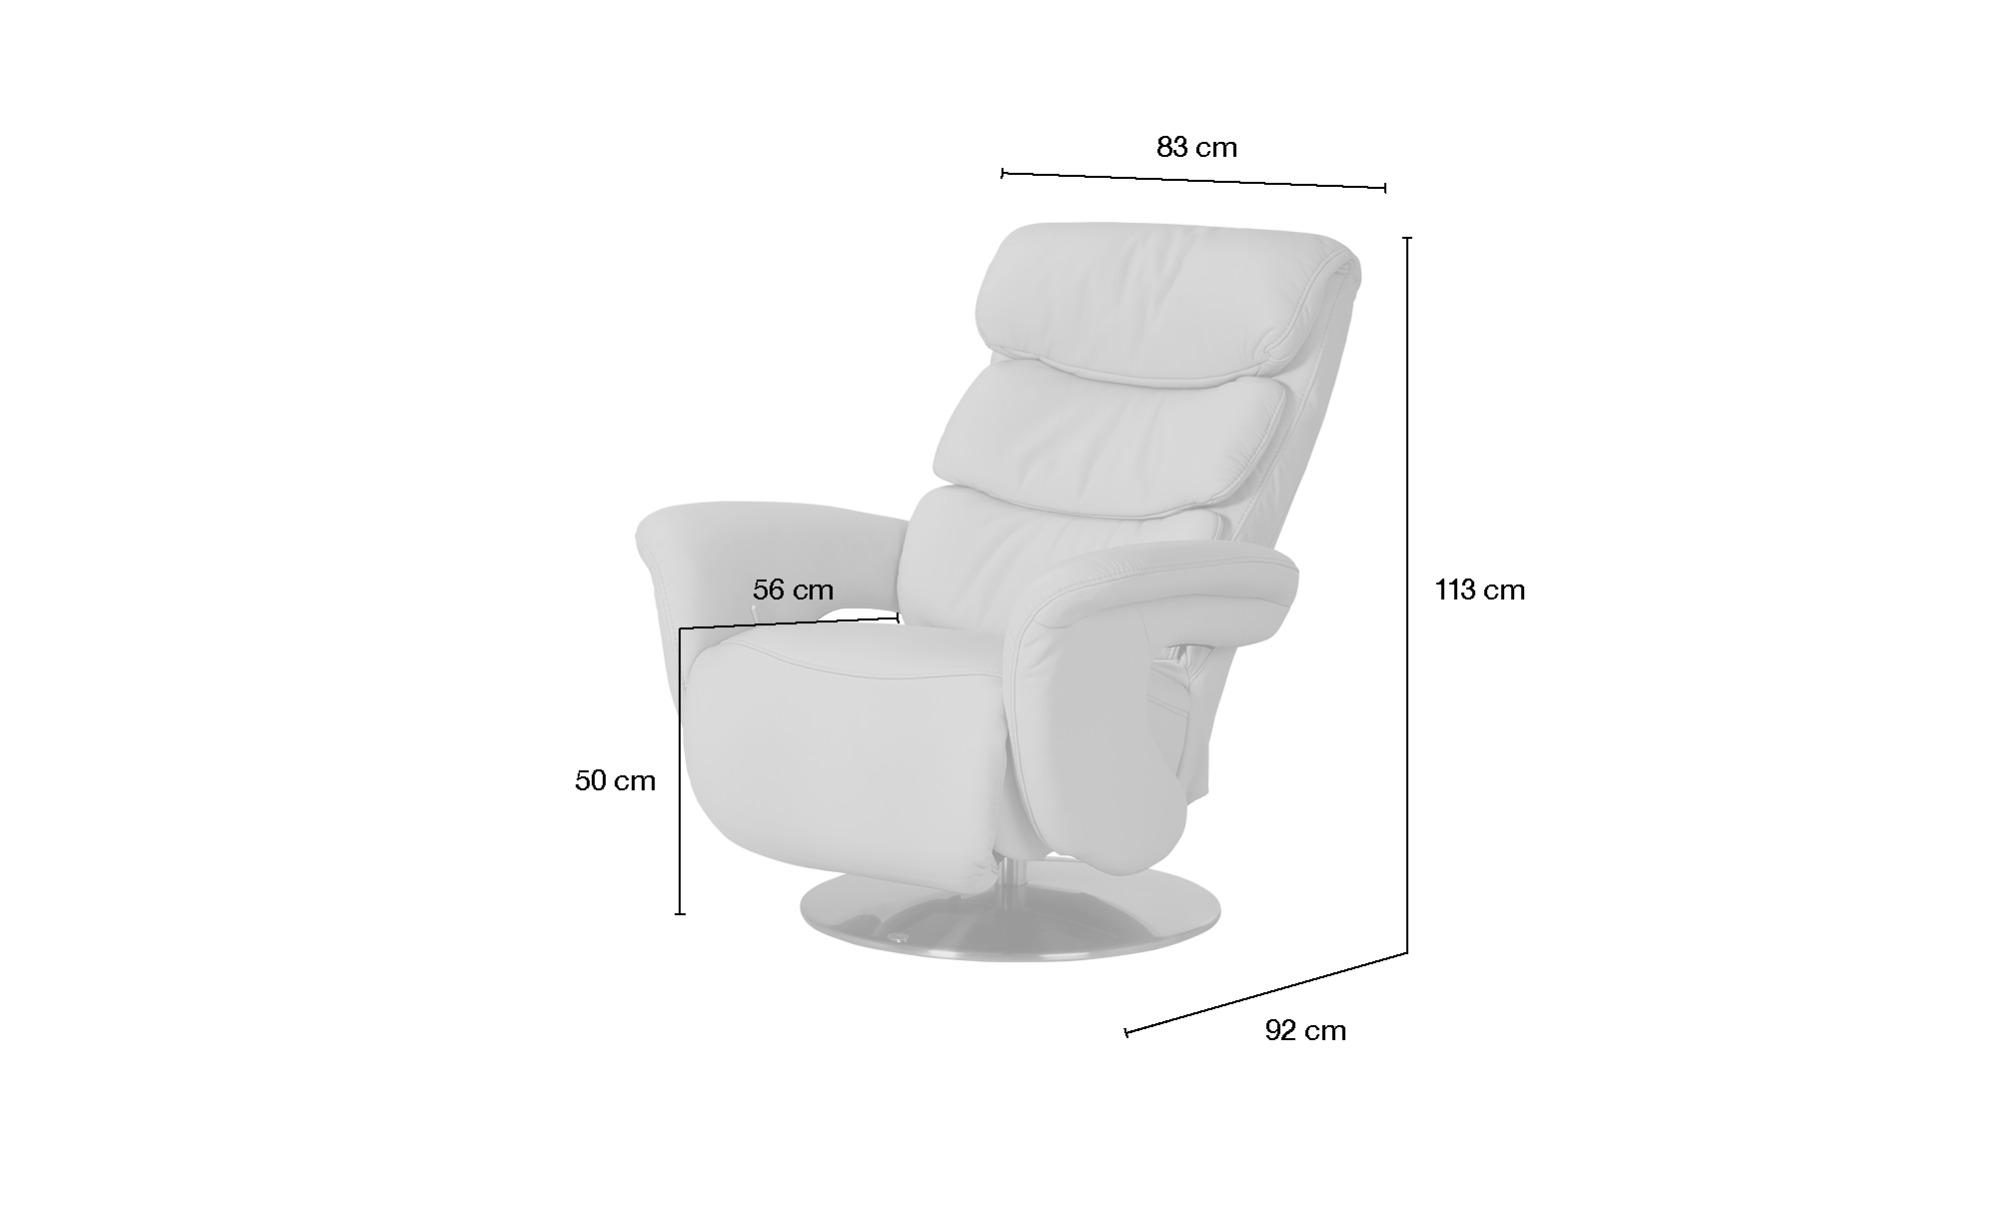 himolla Leder-Relaxsessel schwarz - Leder 7228 ¦ schwarz ¦ Maße (cm): B: 83 H: 113 T: 92 Polstermöbel > Sessel > Fernsehsessel - Höffner